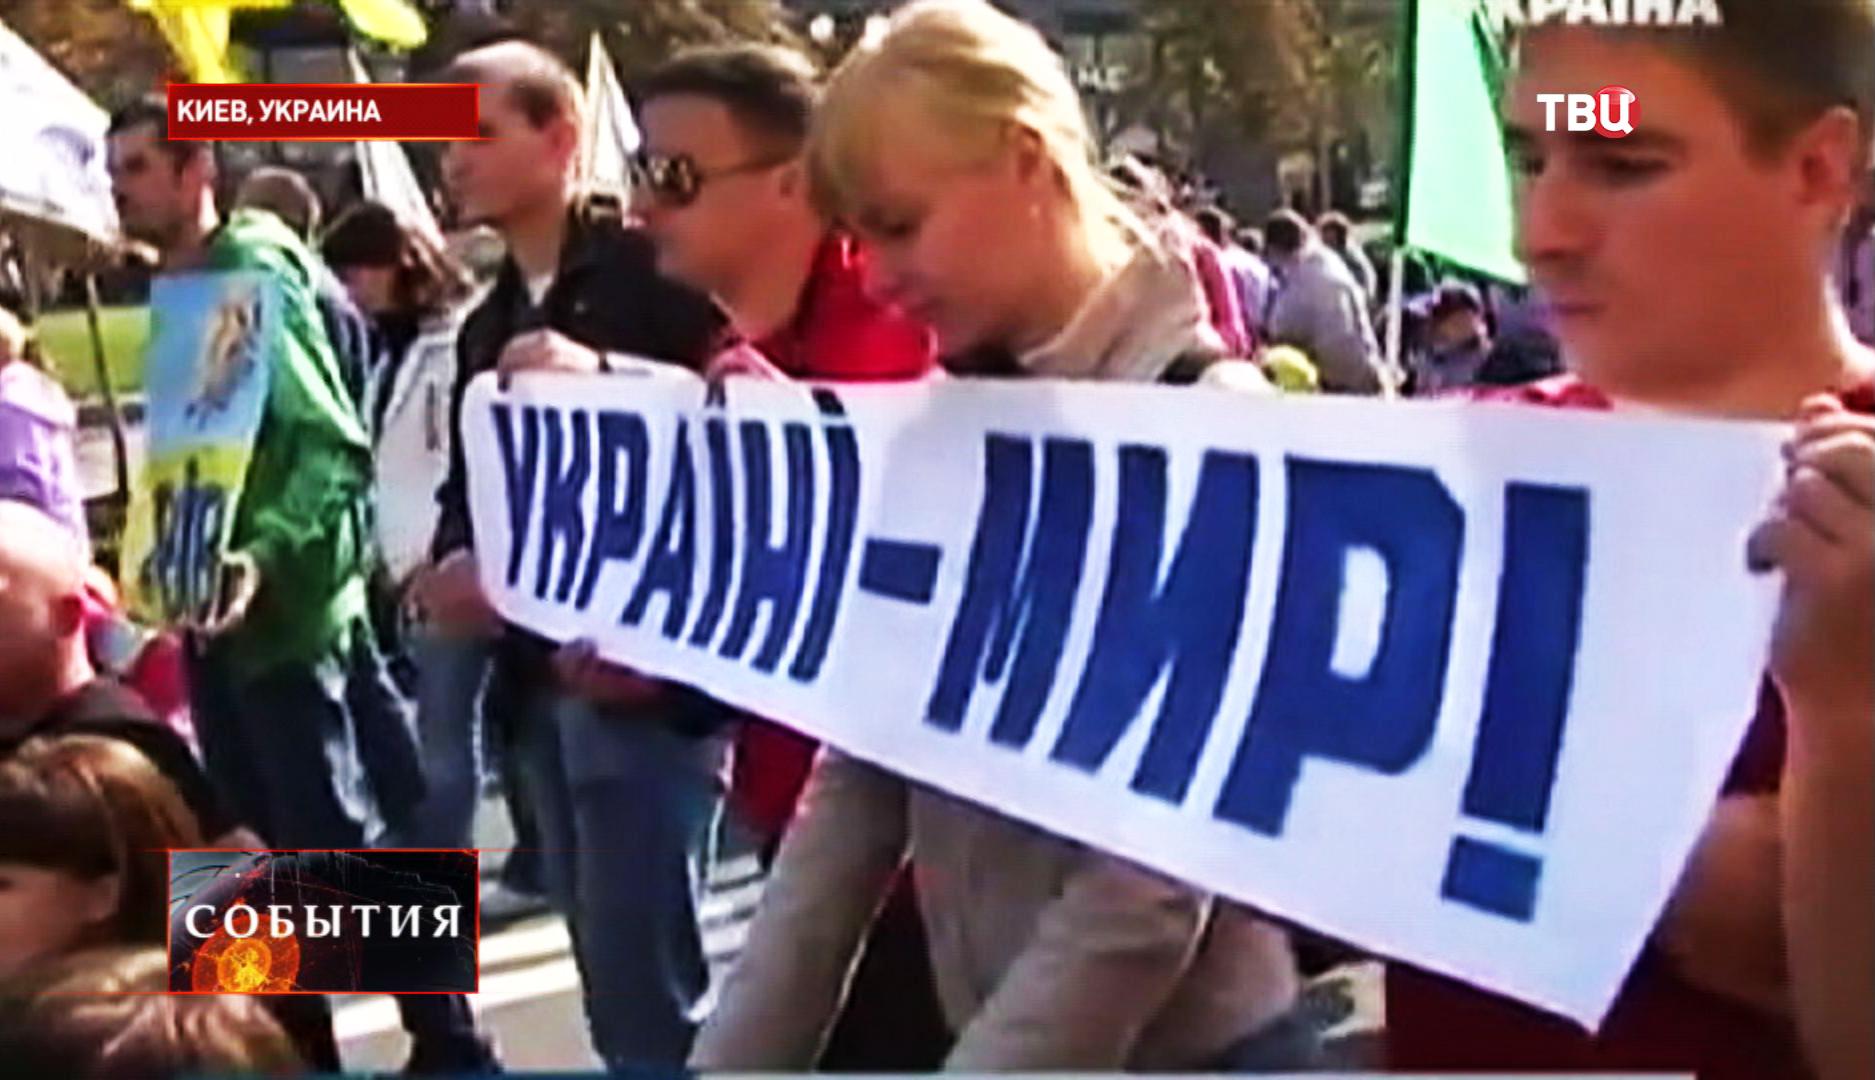 Антивоенный митинг на Украине